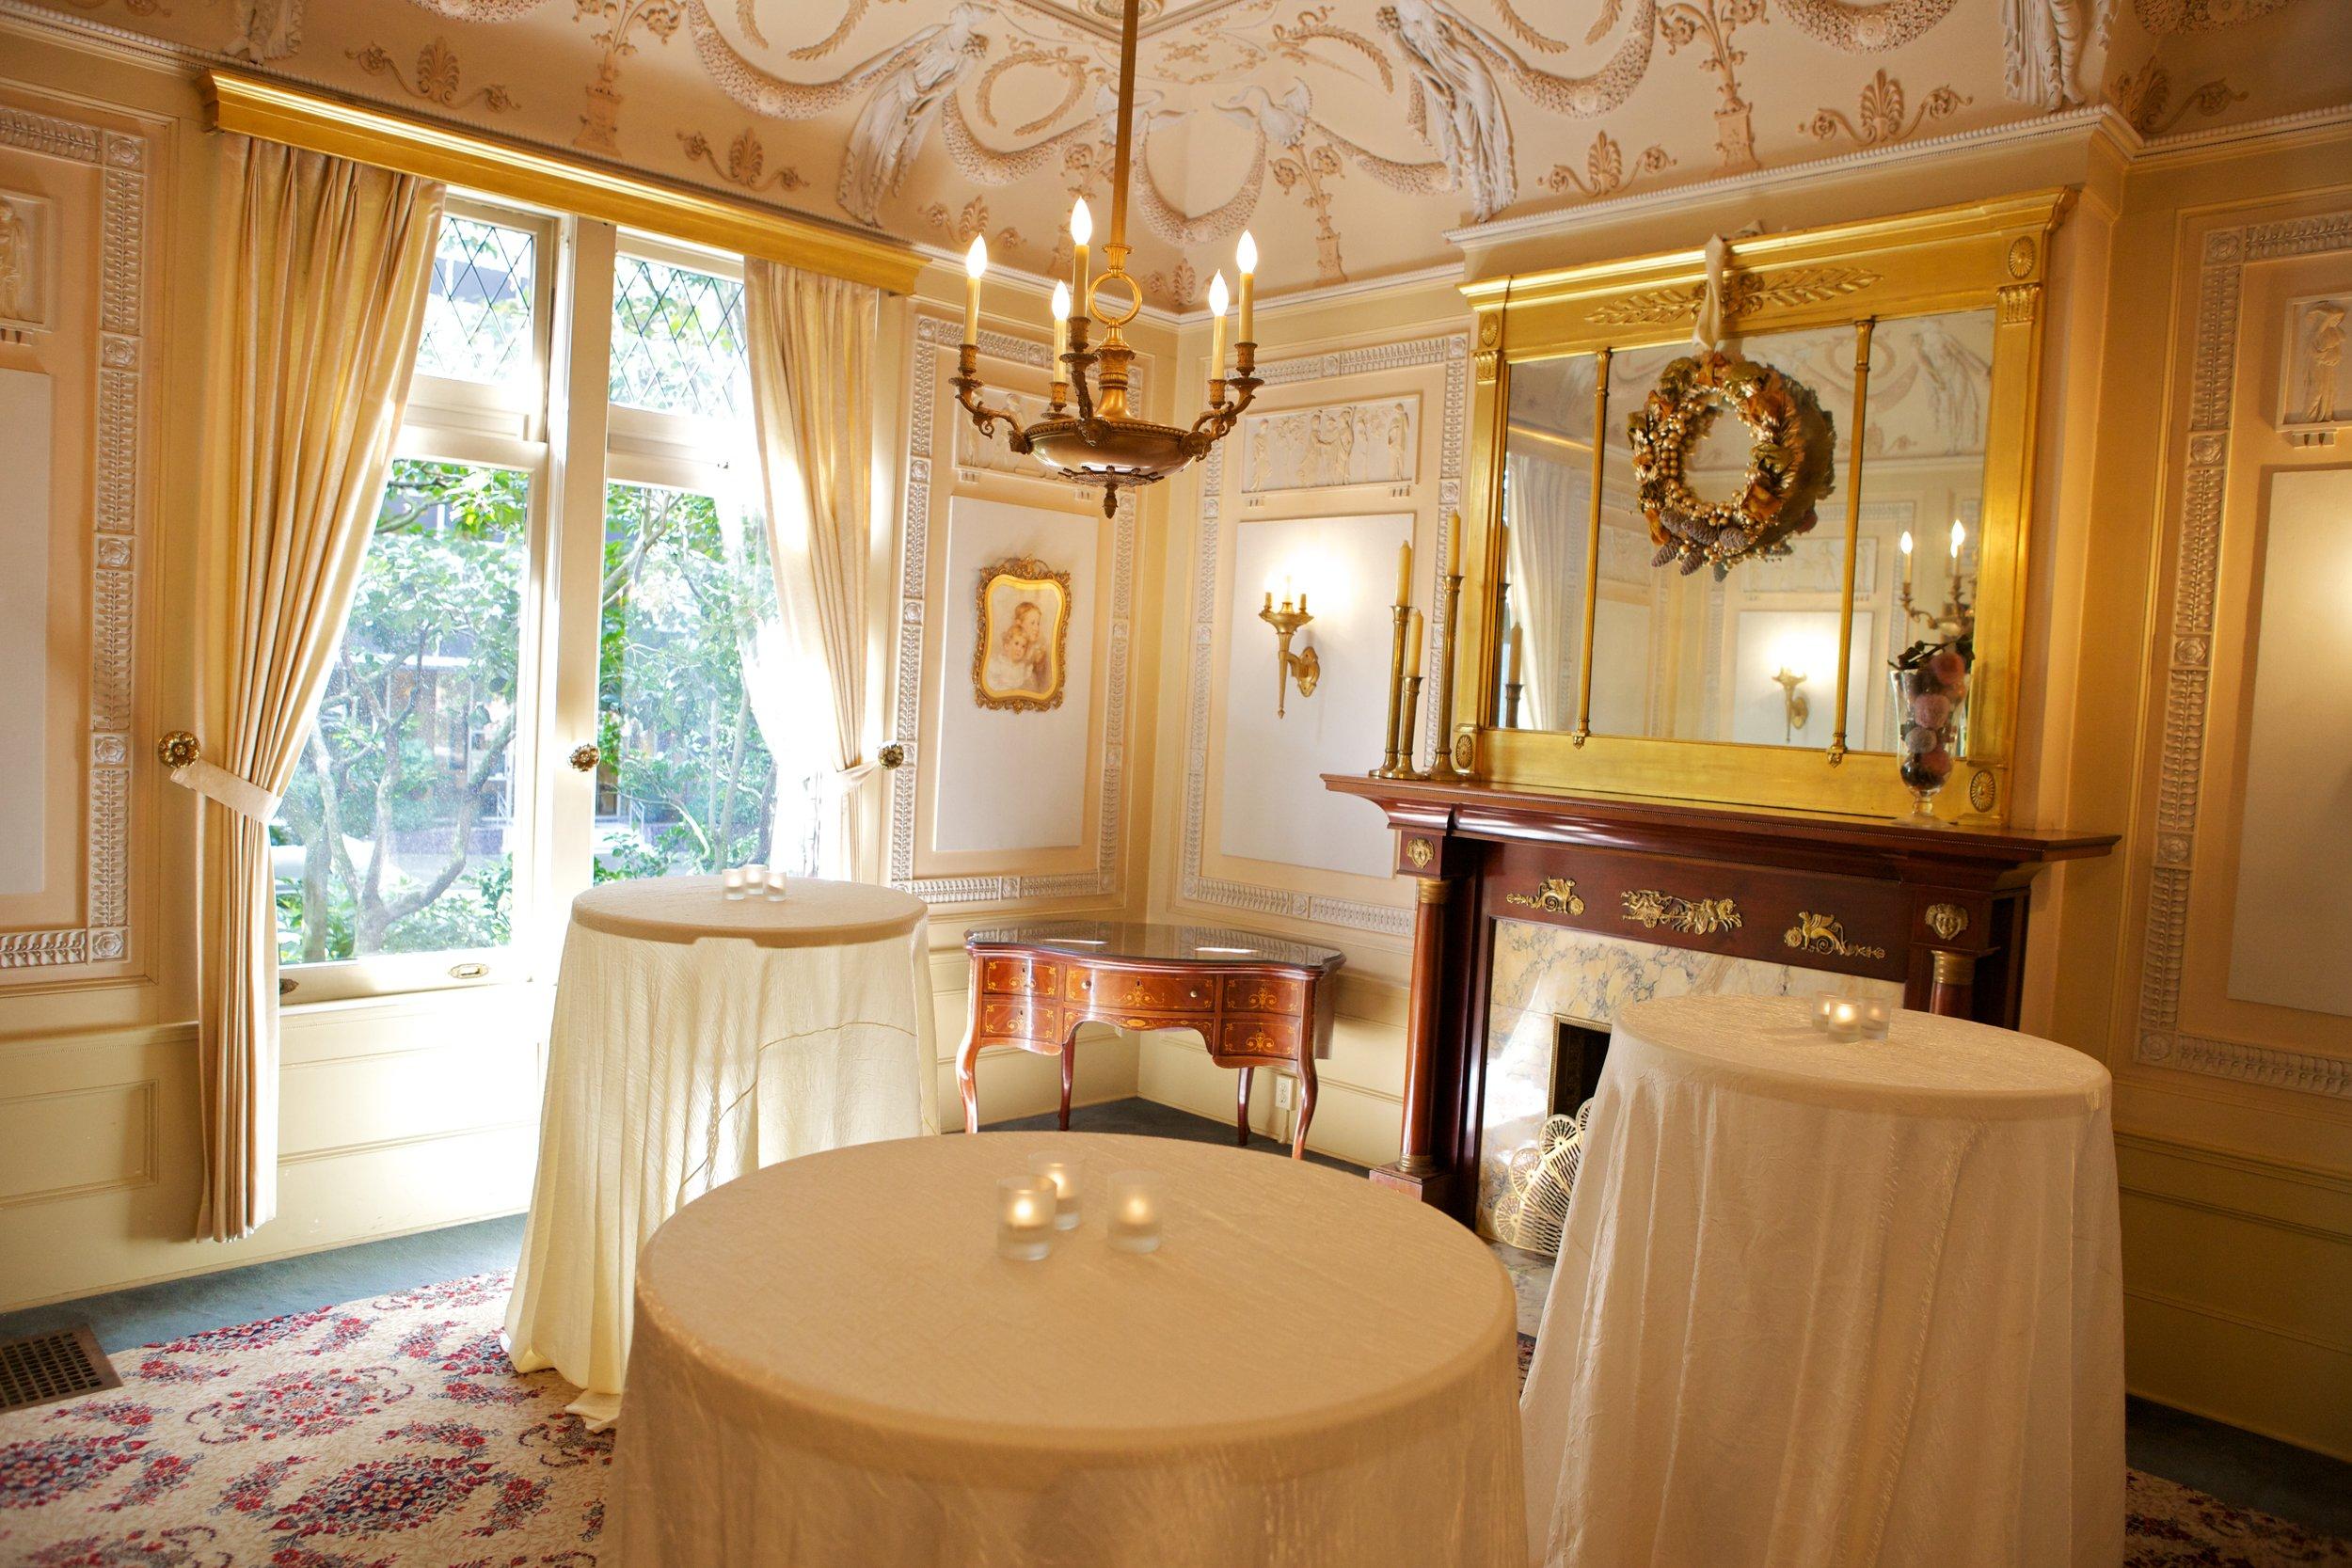 The Stimson-Green Mansion